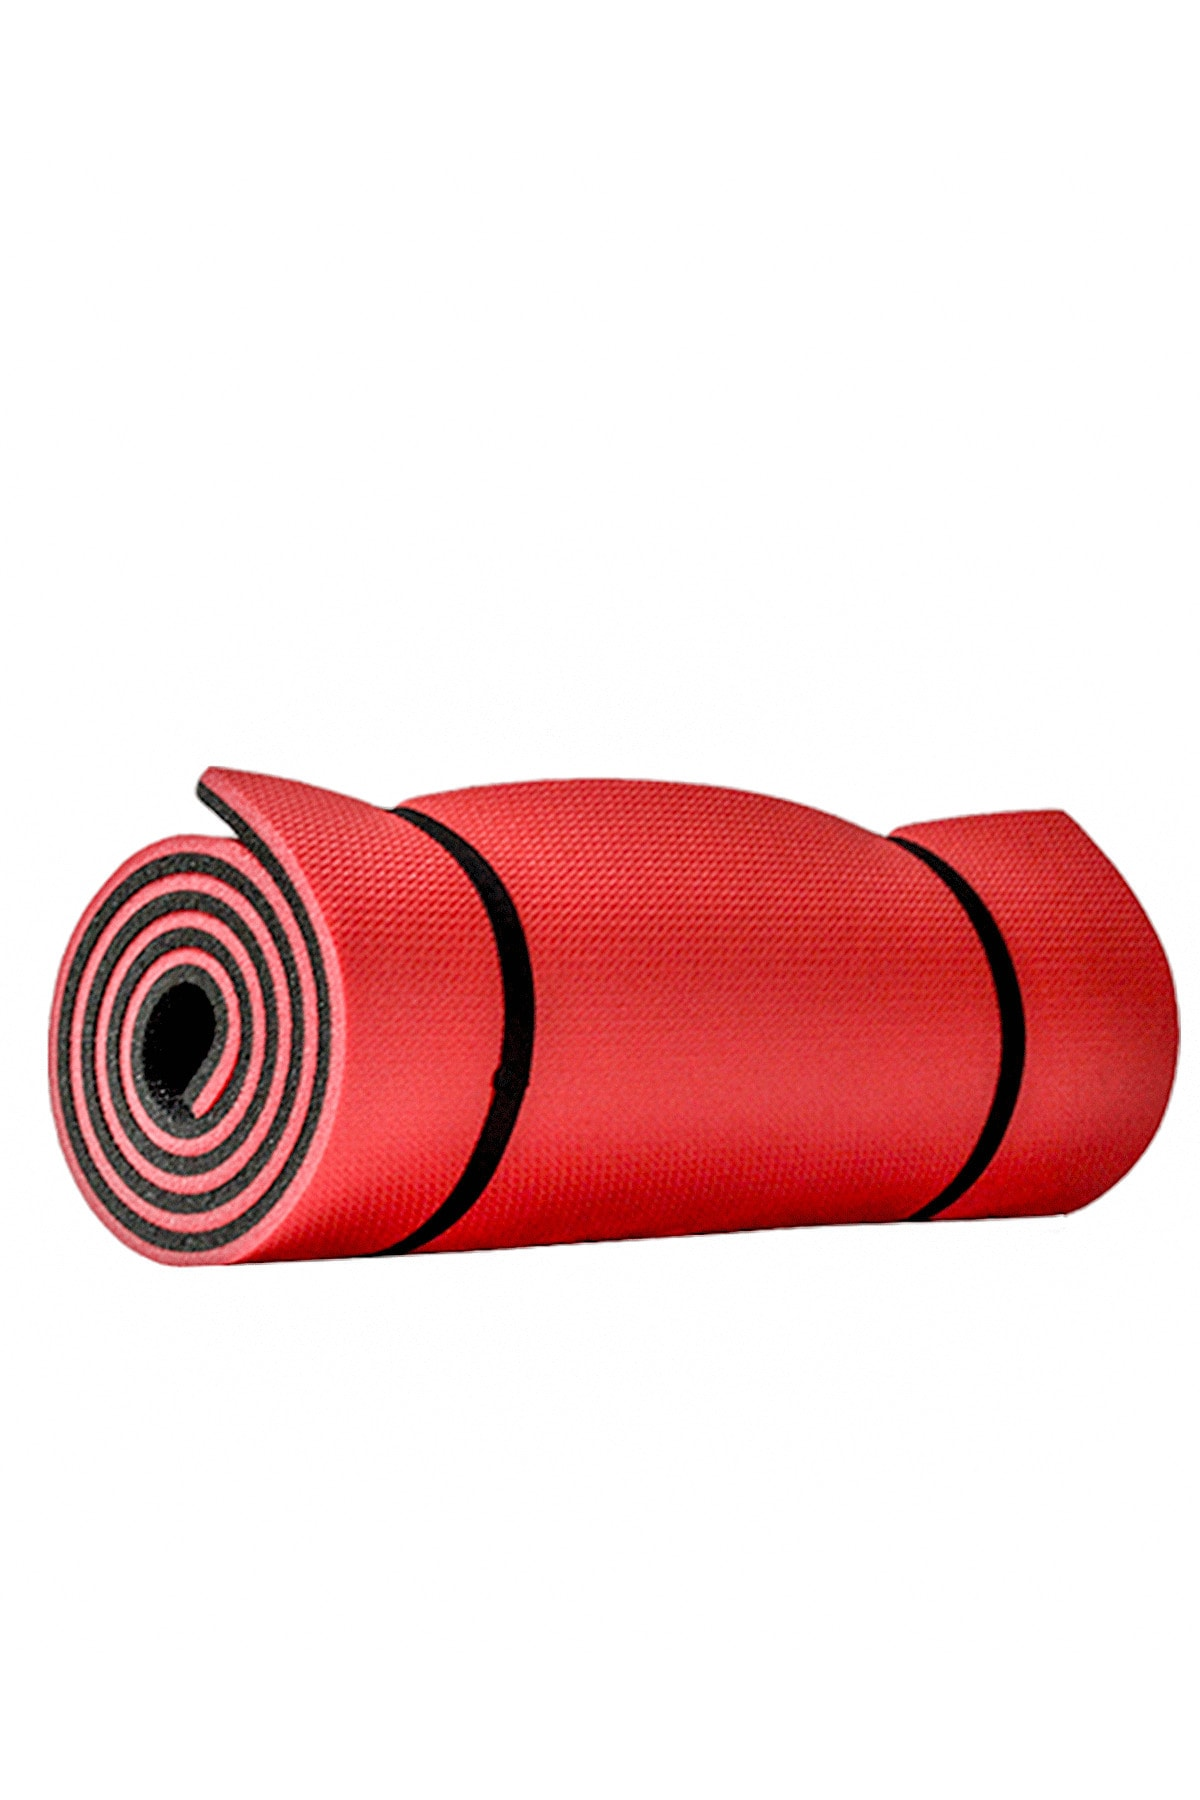 Voven Pembe Profesyonel Yoga Matı 10 Mm Pilates Minderi Pembe 1